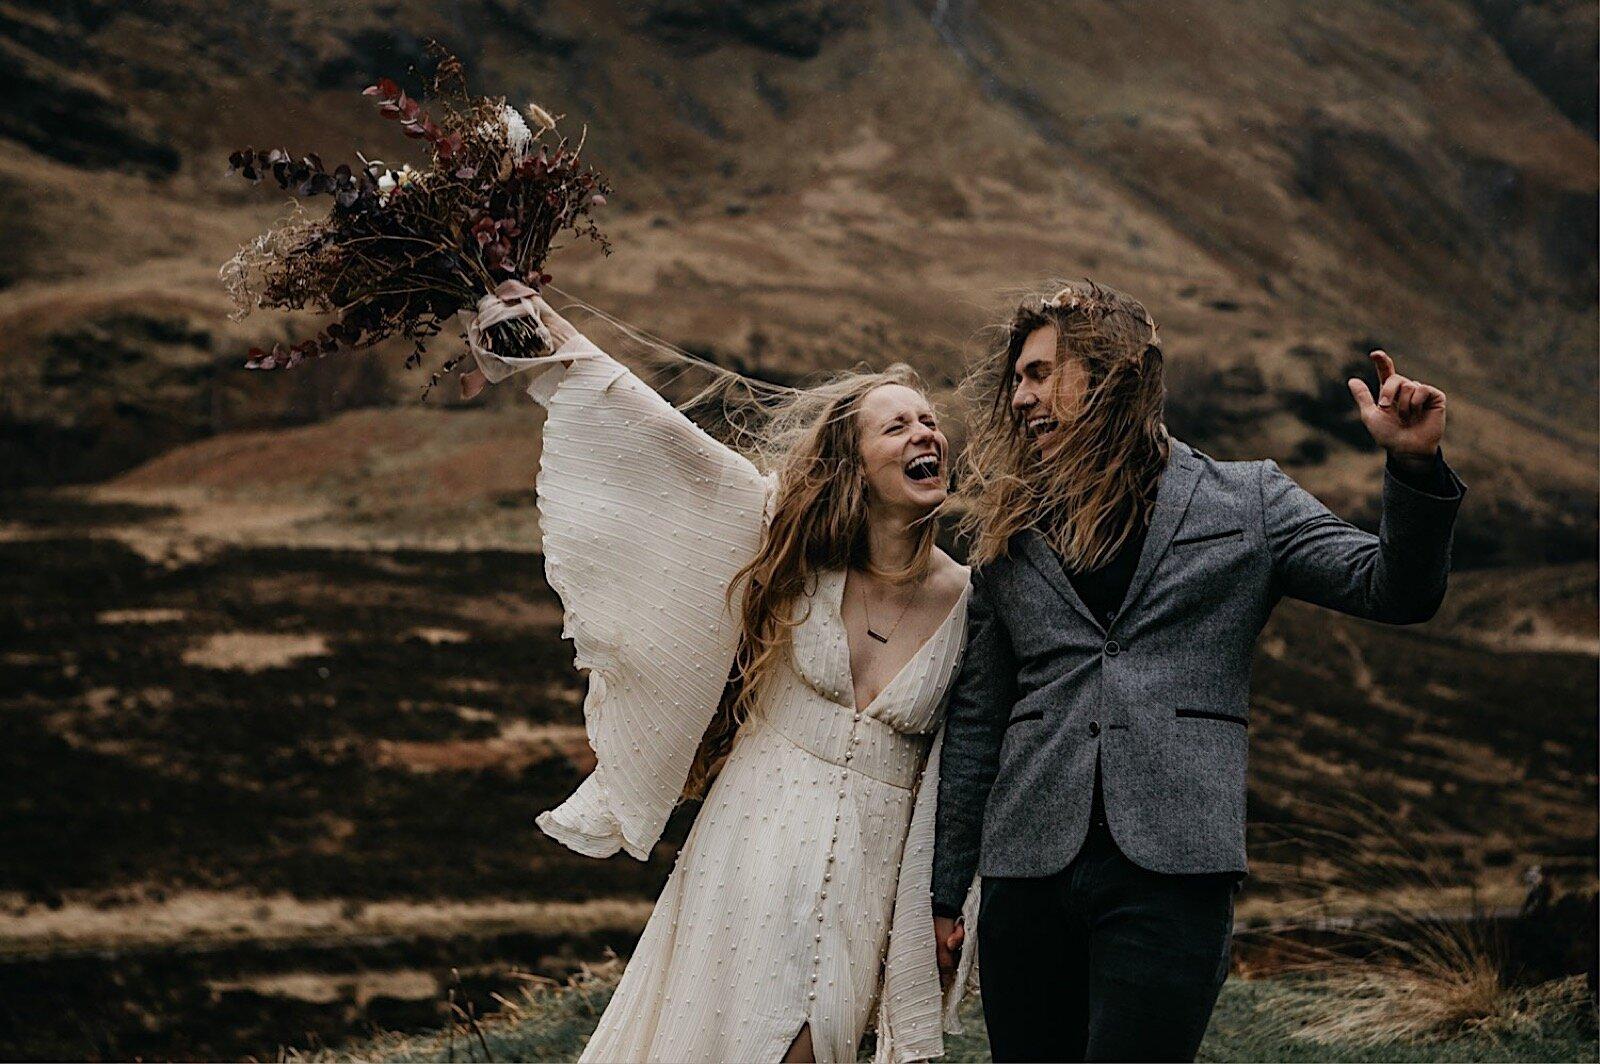 07_scotland_couple_shoot_lety_photography (21 von 39).jpg